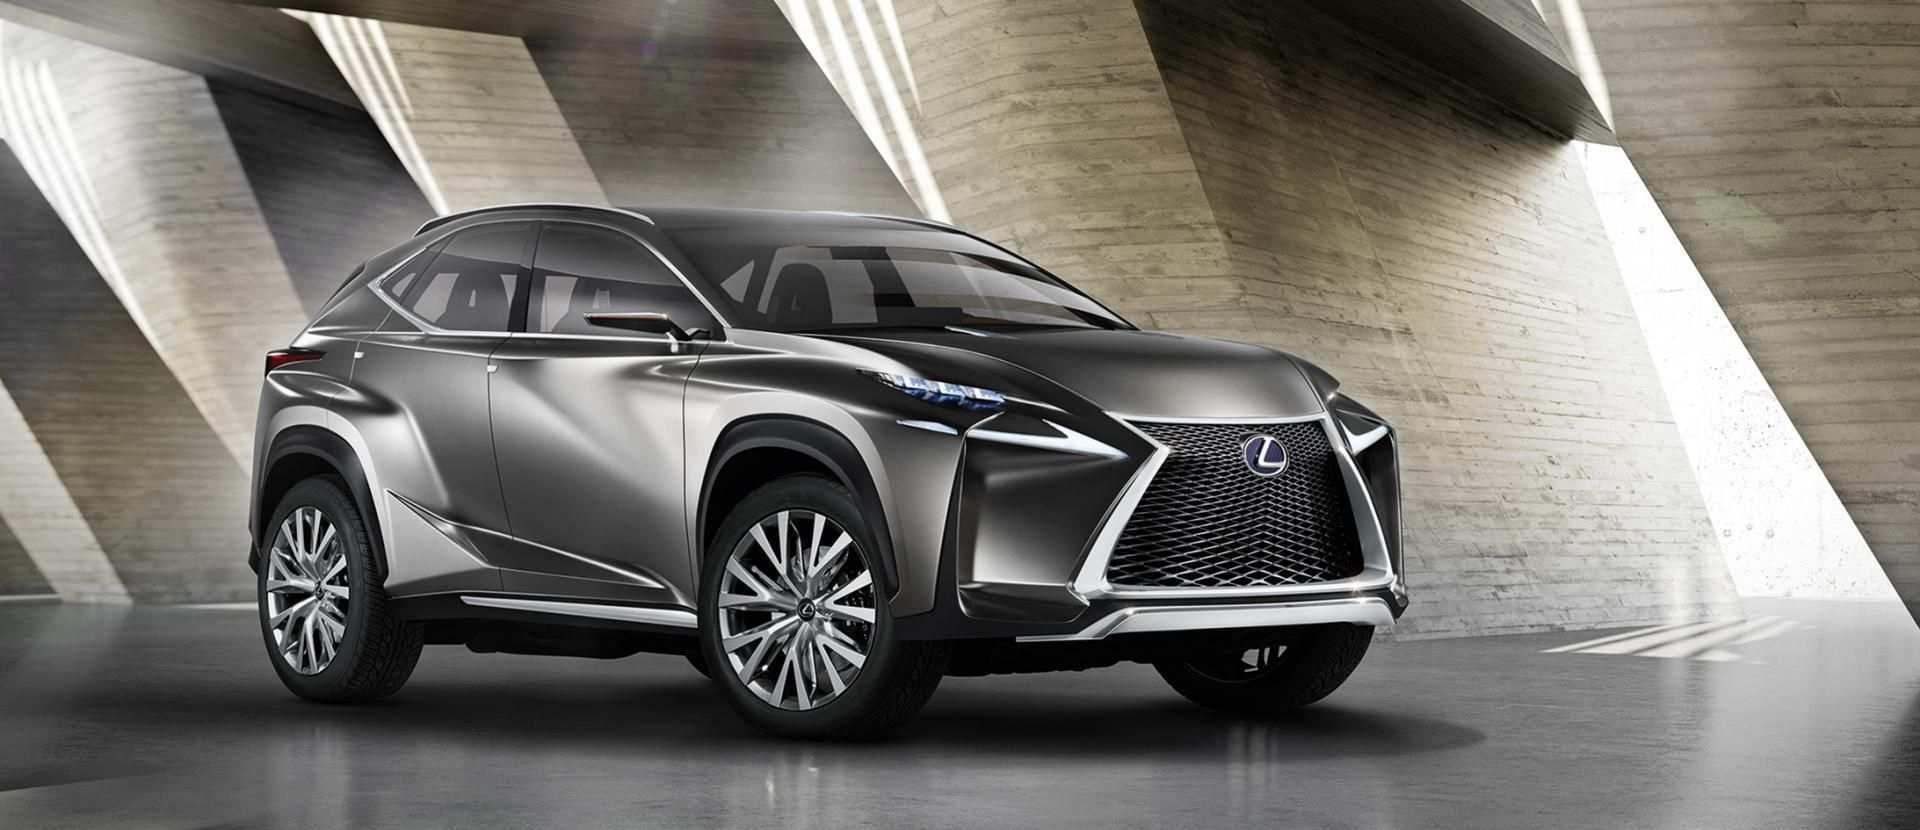 84 Concept of Lexus Is 200T 2020 Photos for Lexus Is 200T 2020